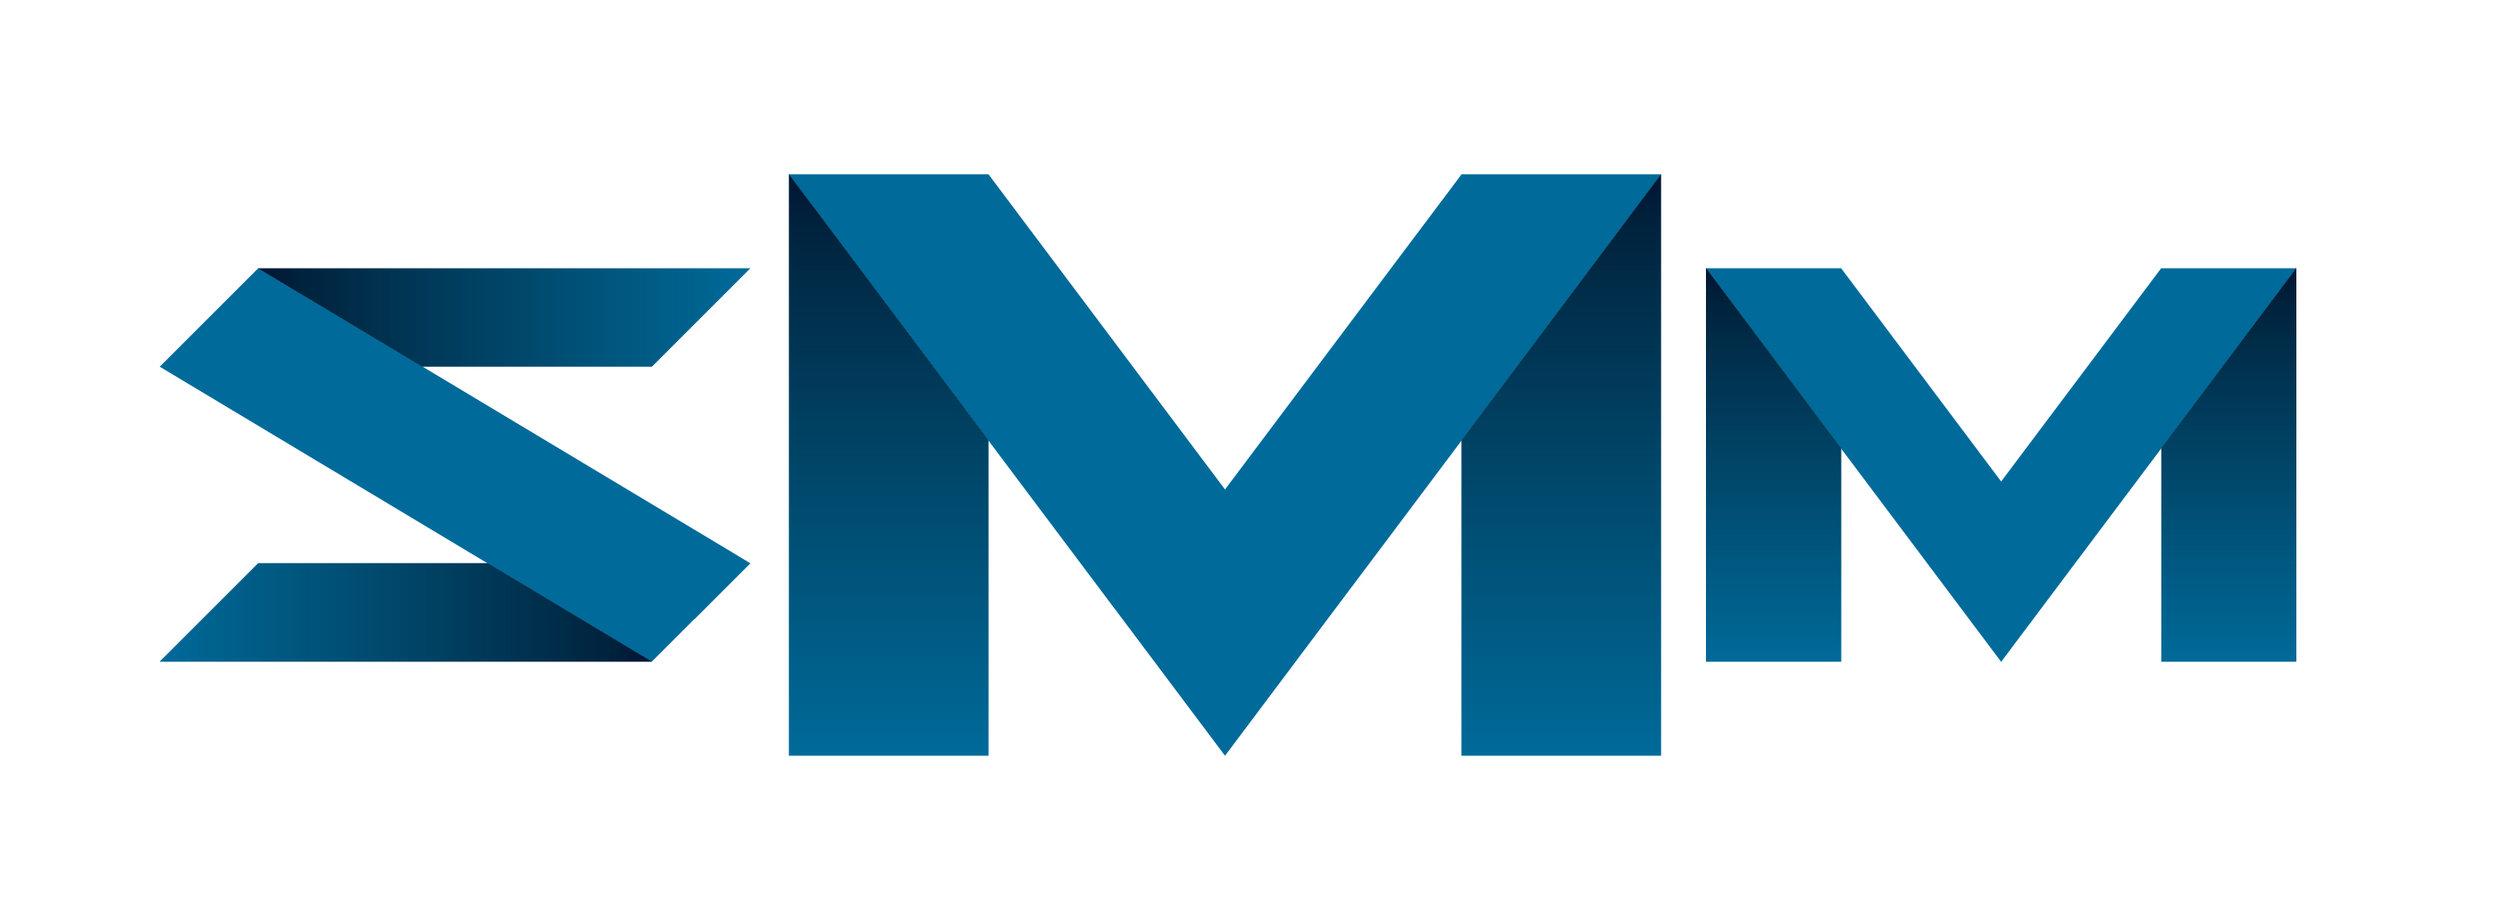 SMM-Logo-FINAL-01.jpg